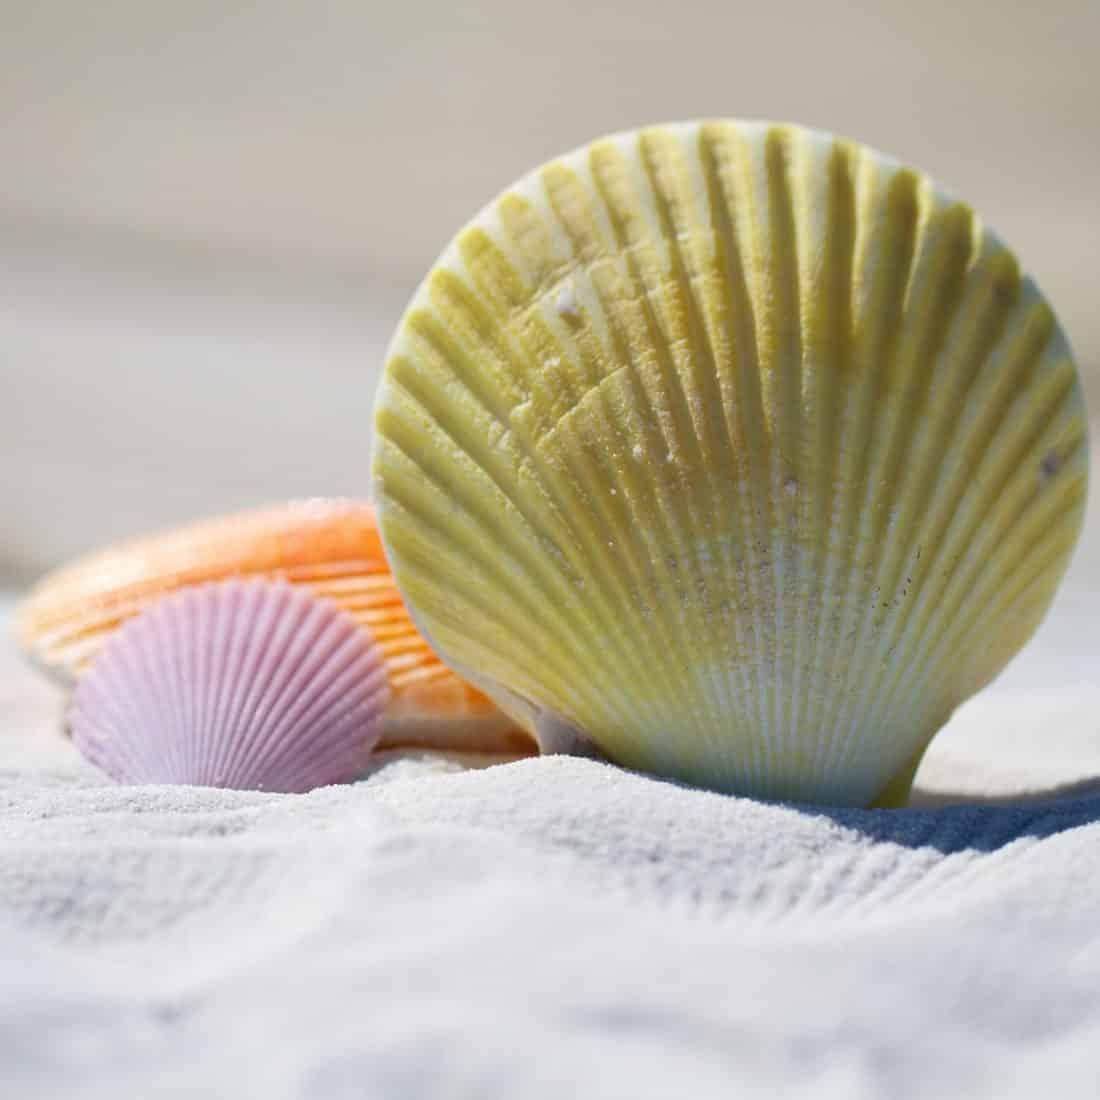 Muscheln Strand pixabay